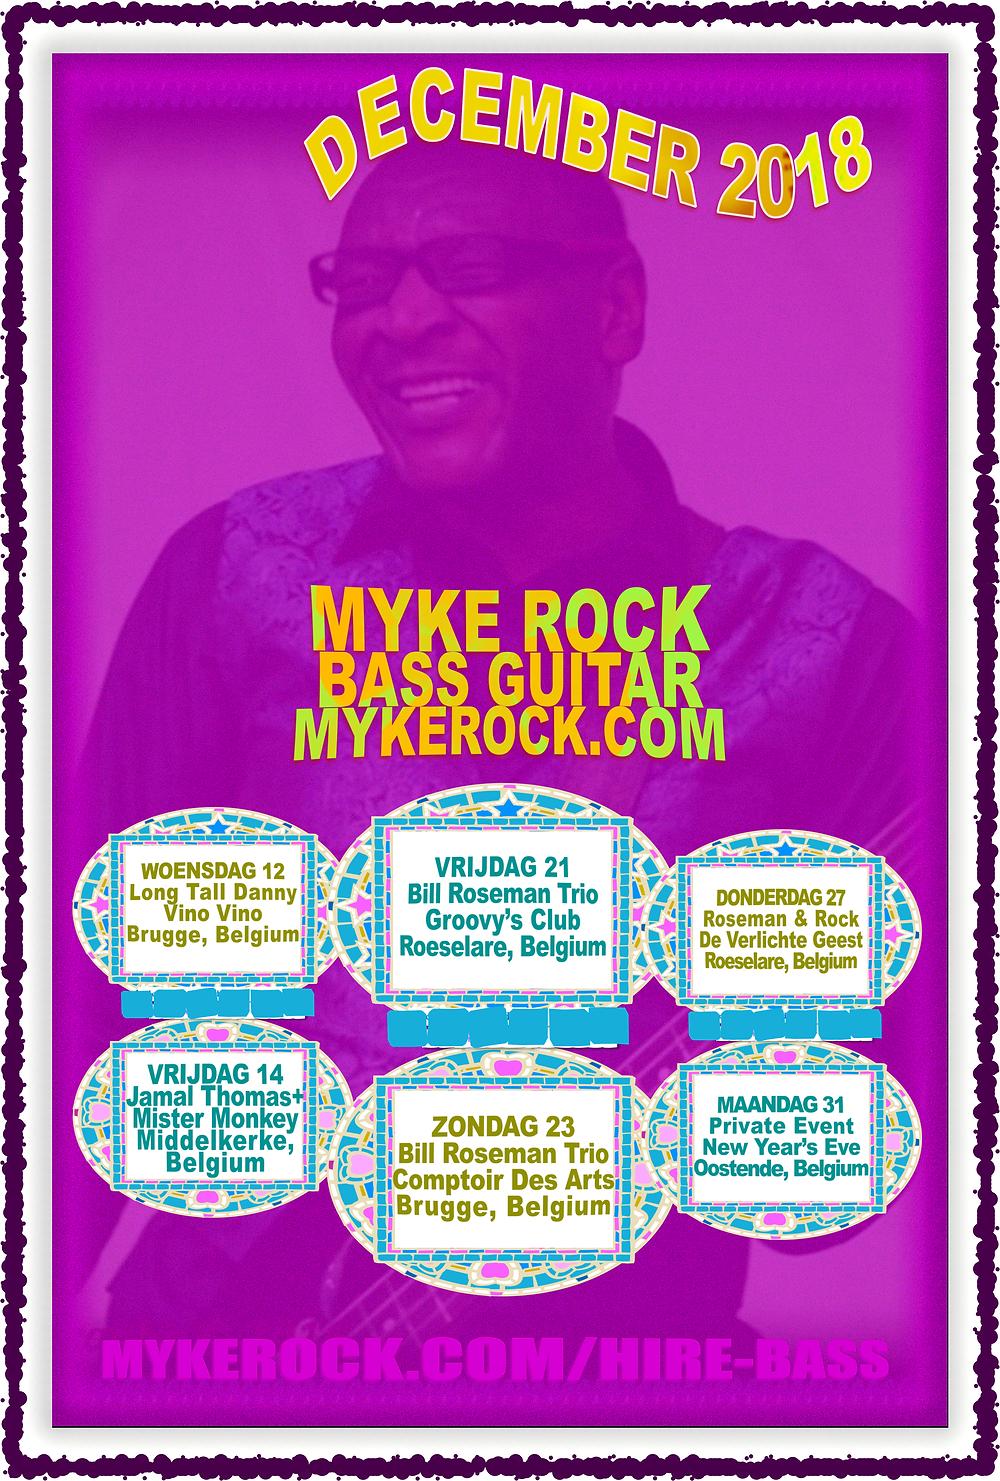 Myke Rock makes 6 Belgium Appearances in December 2018!